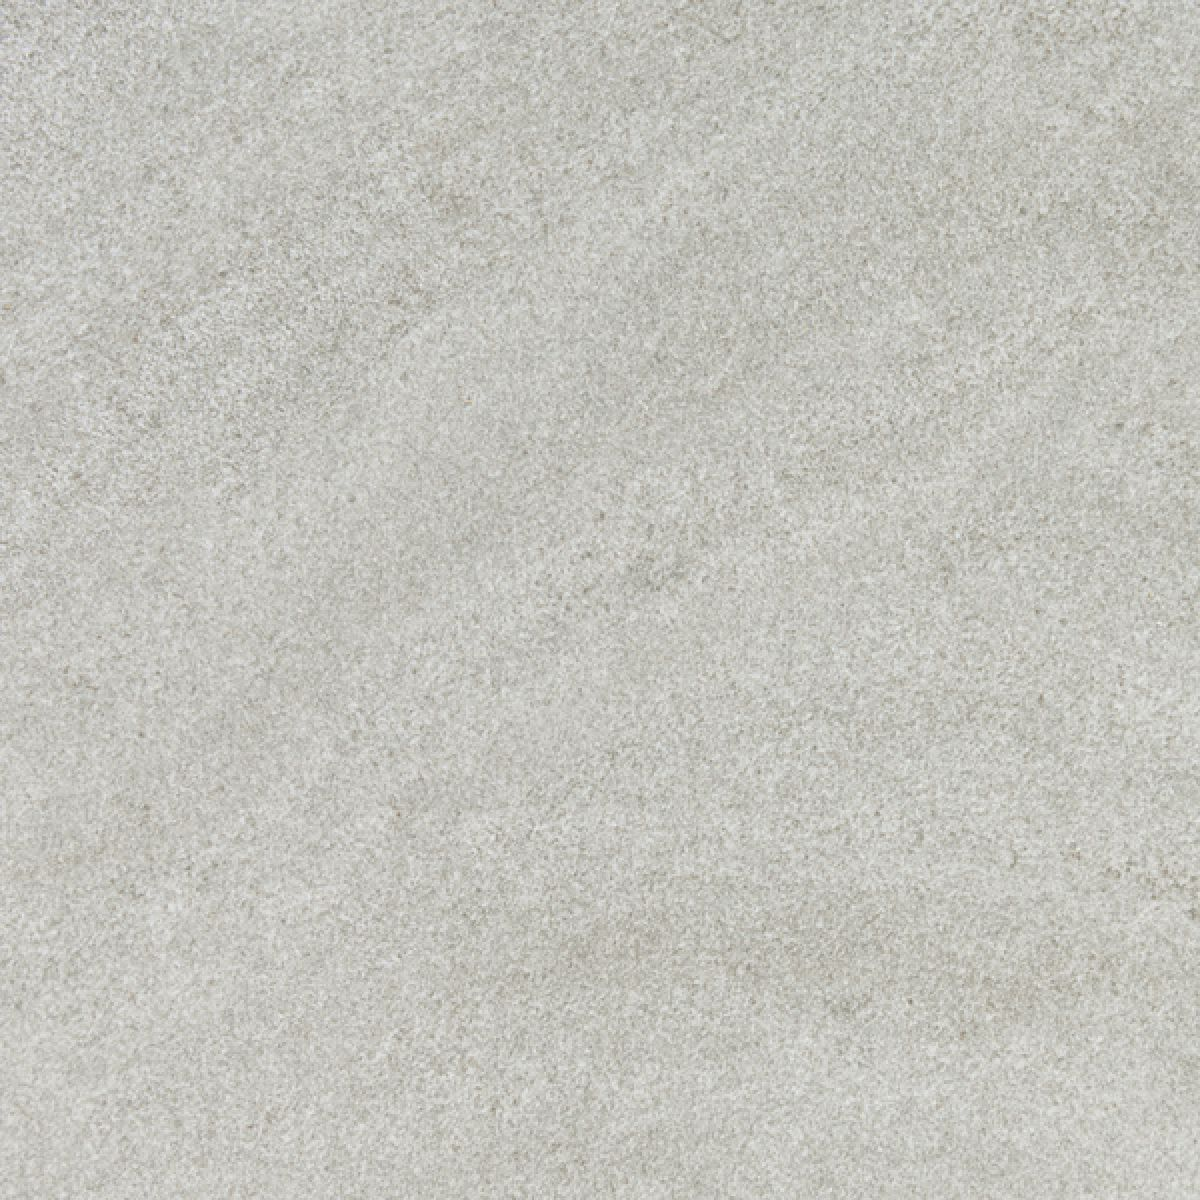 Wetwall Italian Rossano Sand Shower Panel